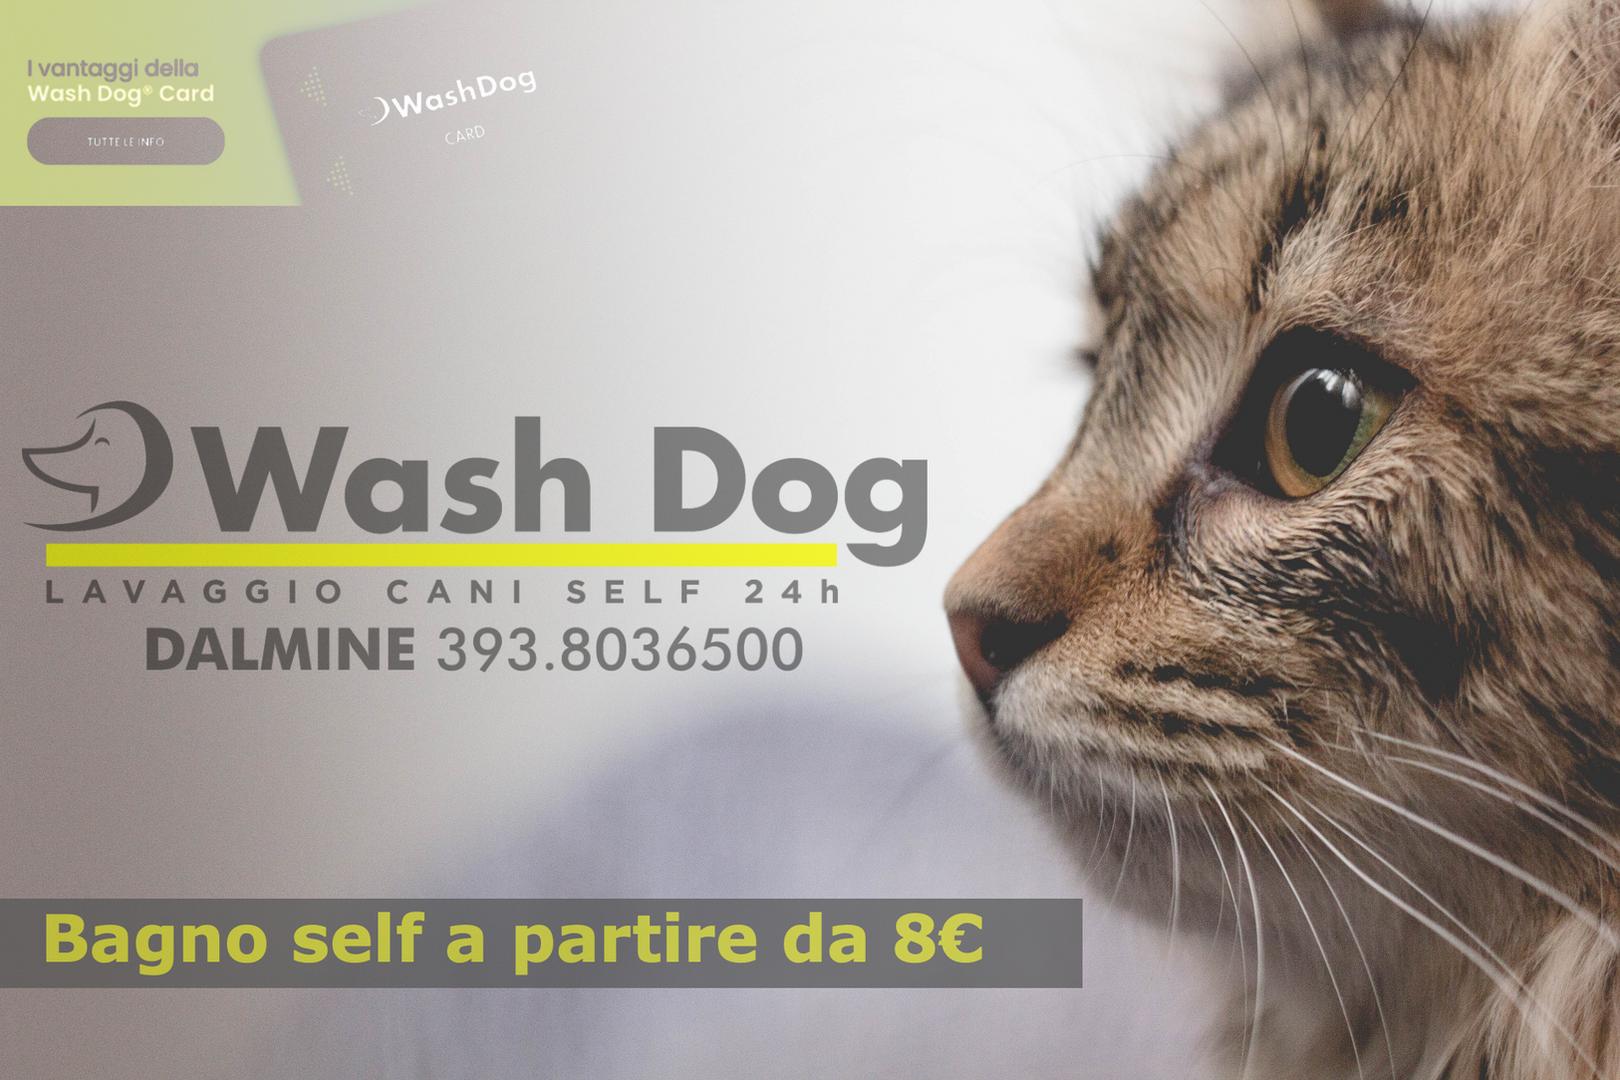 Washdog-Self-Aperto-24h.png